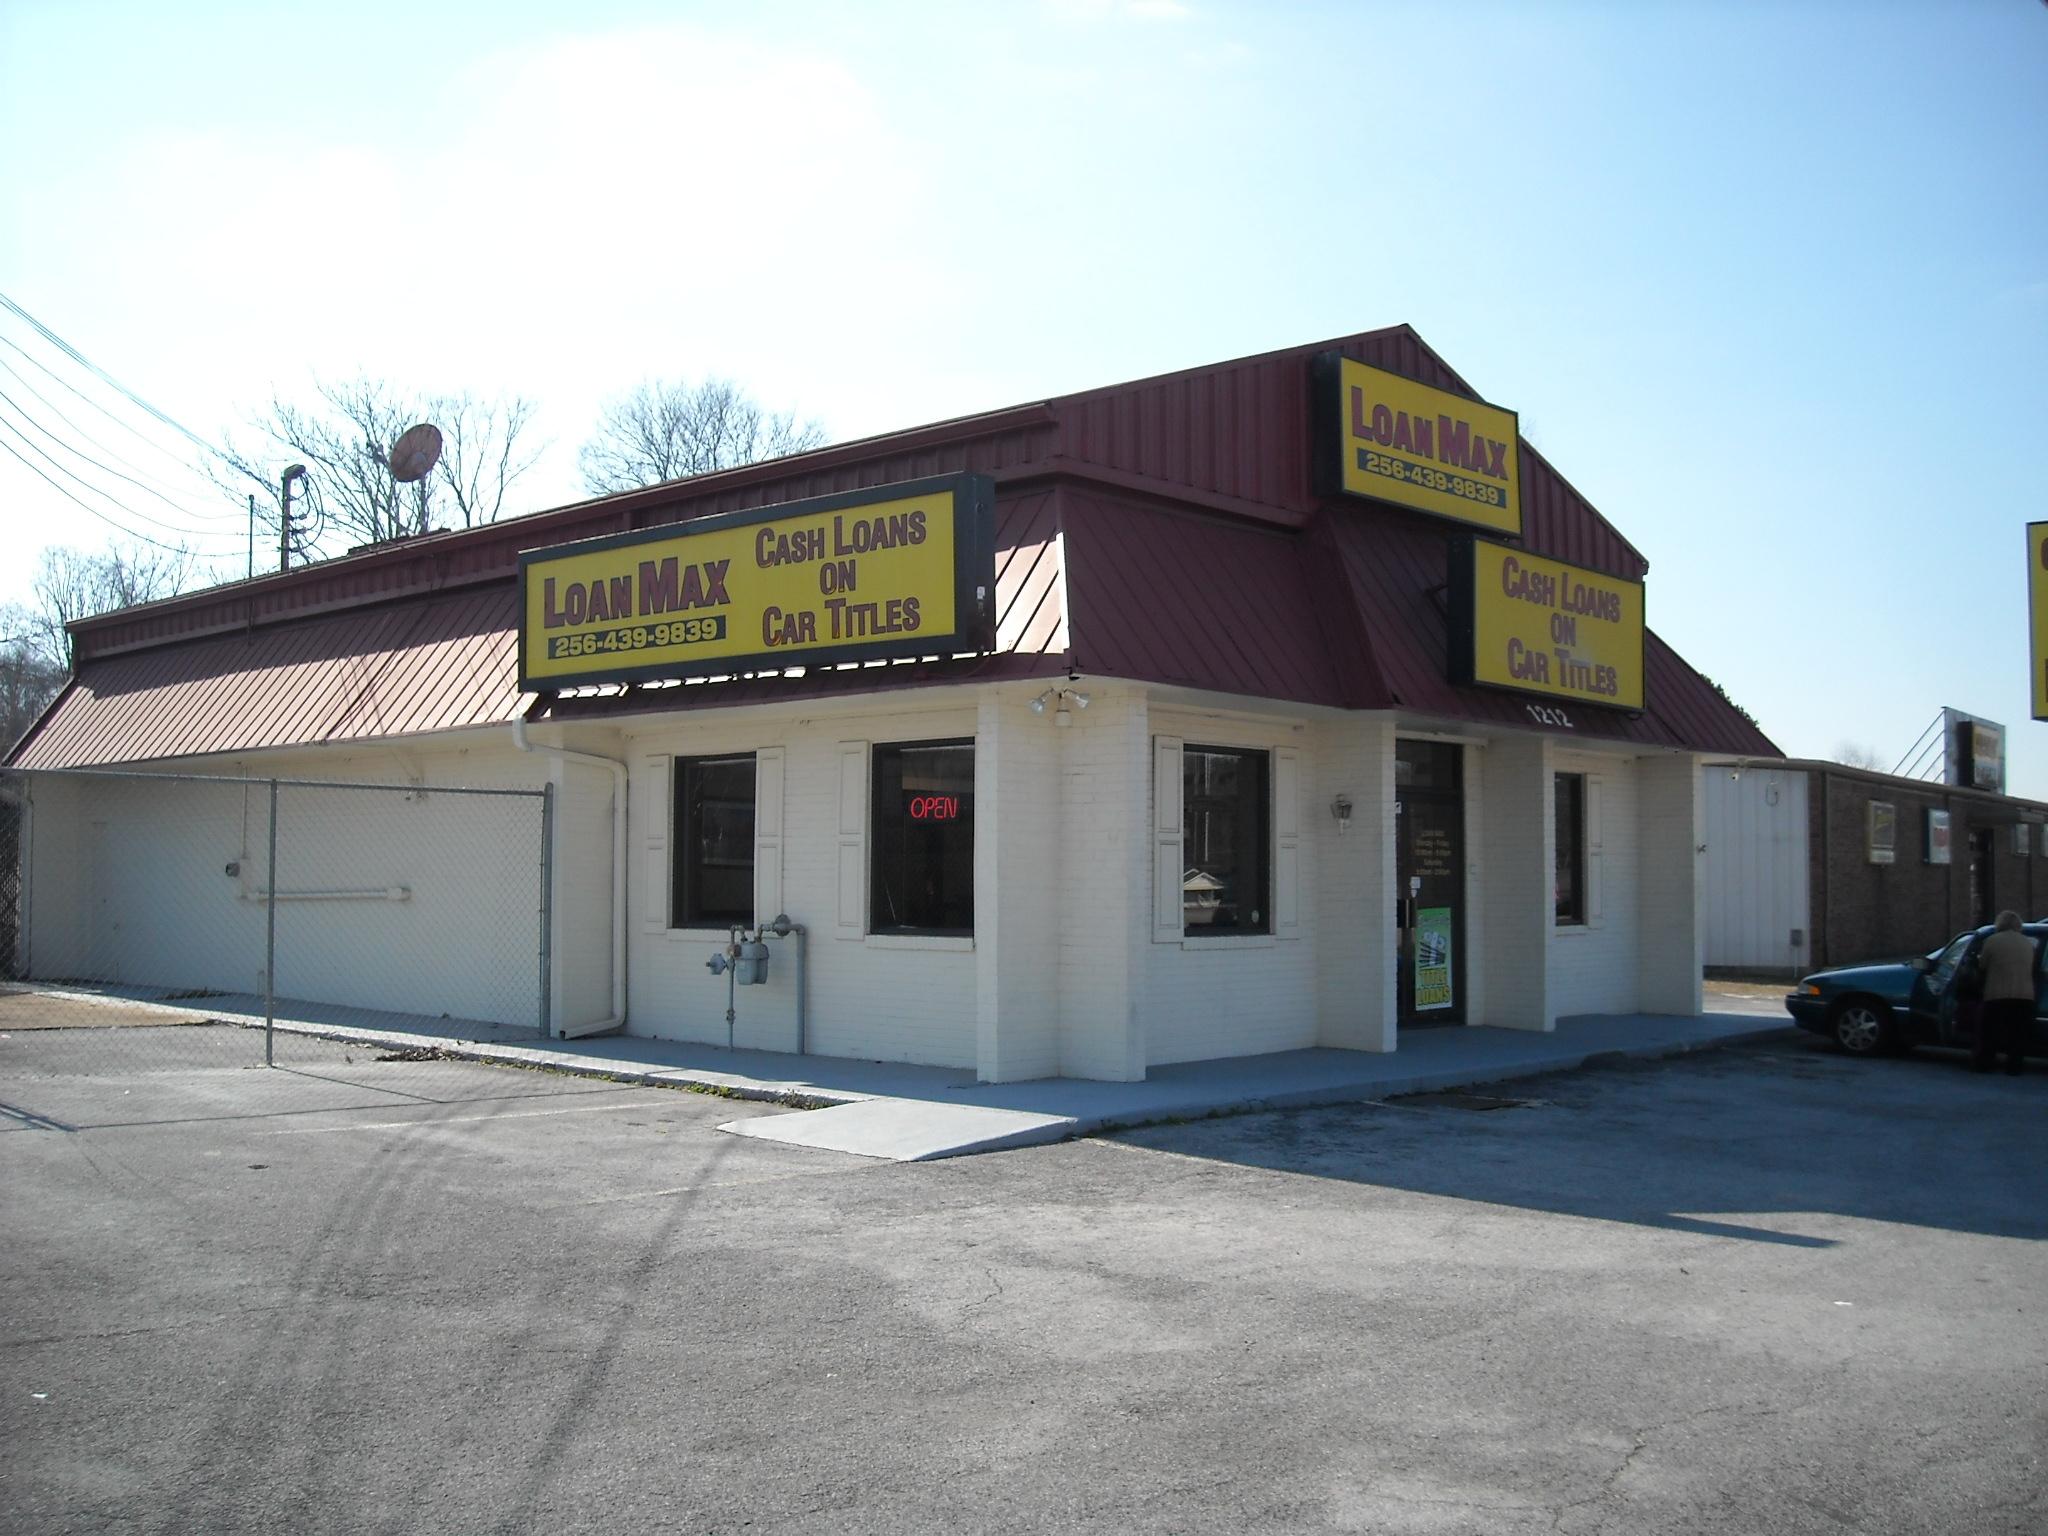 Advance america cash advance old st augustine rd jacksonville fl photo 4